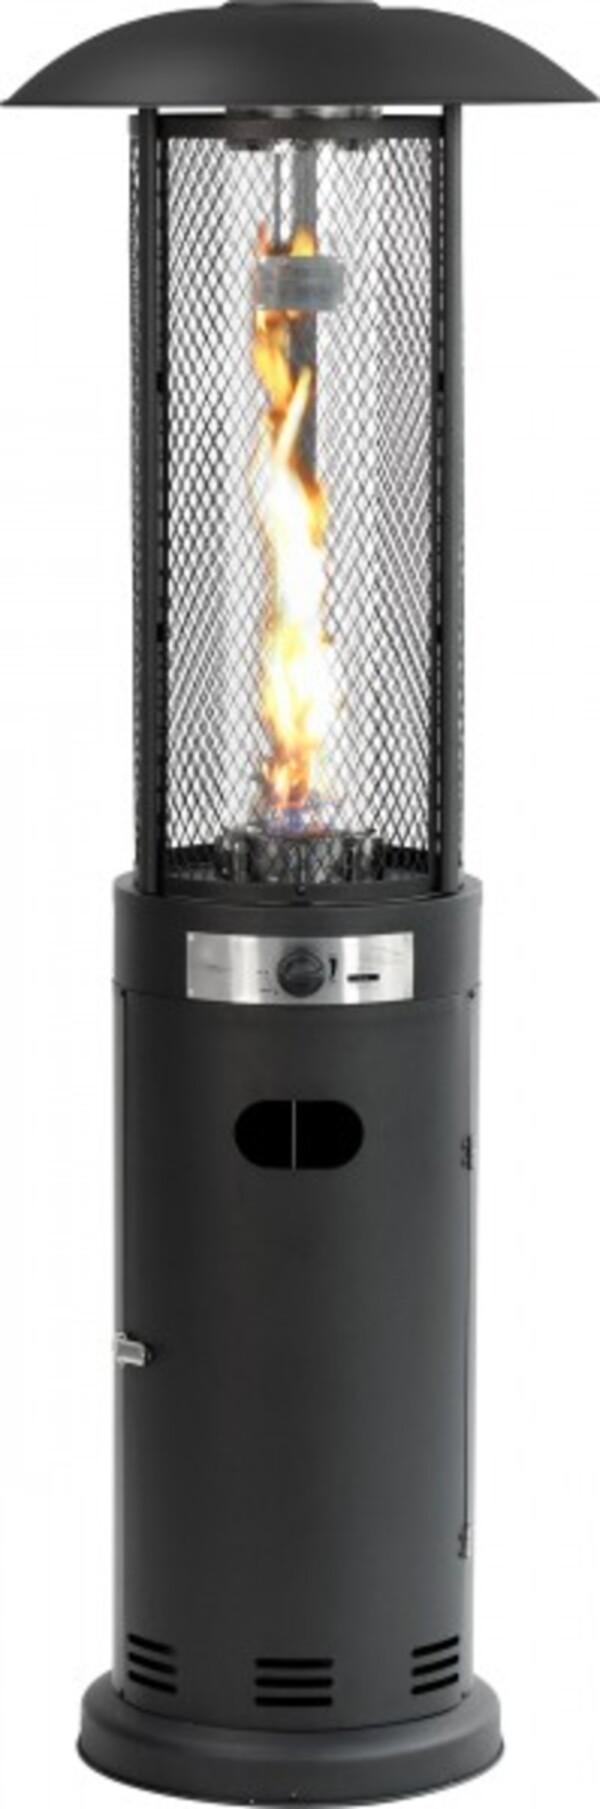 Primaster Feuersäule Arenal ,  max. 11 kW, stufenlos regulierbar, 182 cm